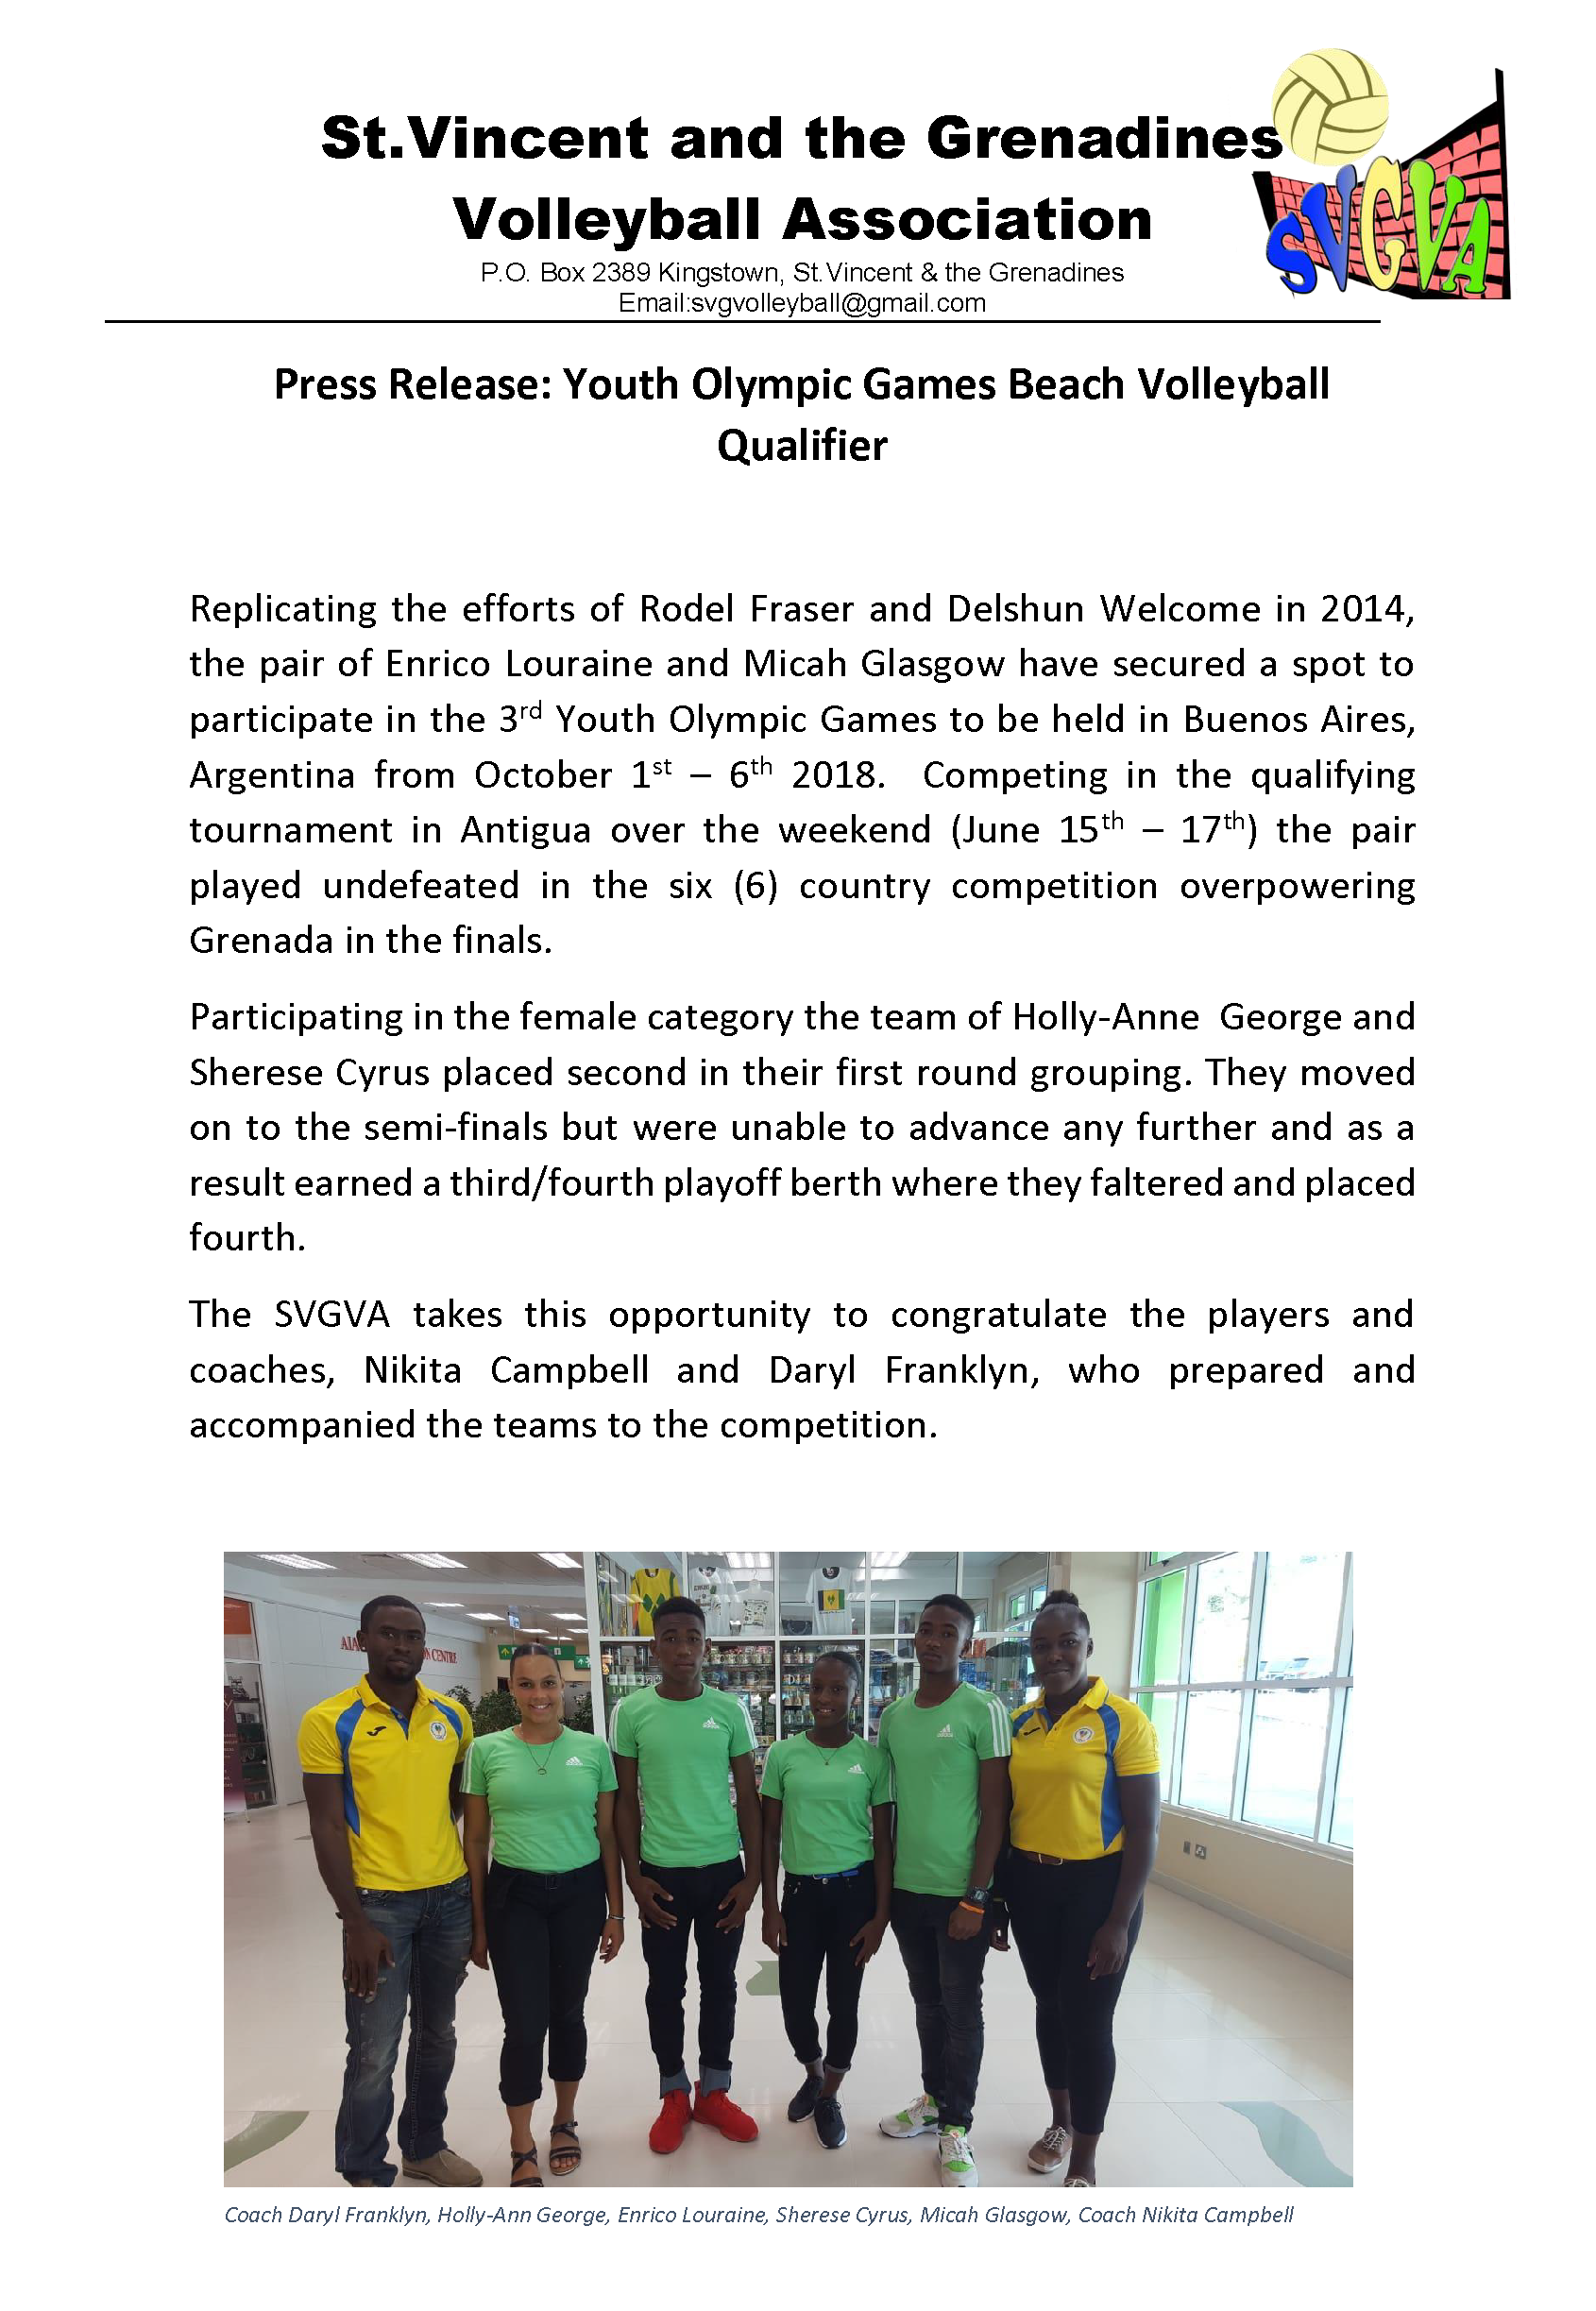 2018 Jun 17 Press Release - YOG2018 Beach Volleyball Qualifier